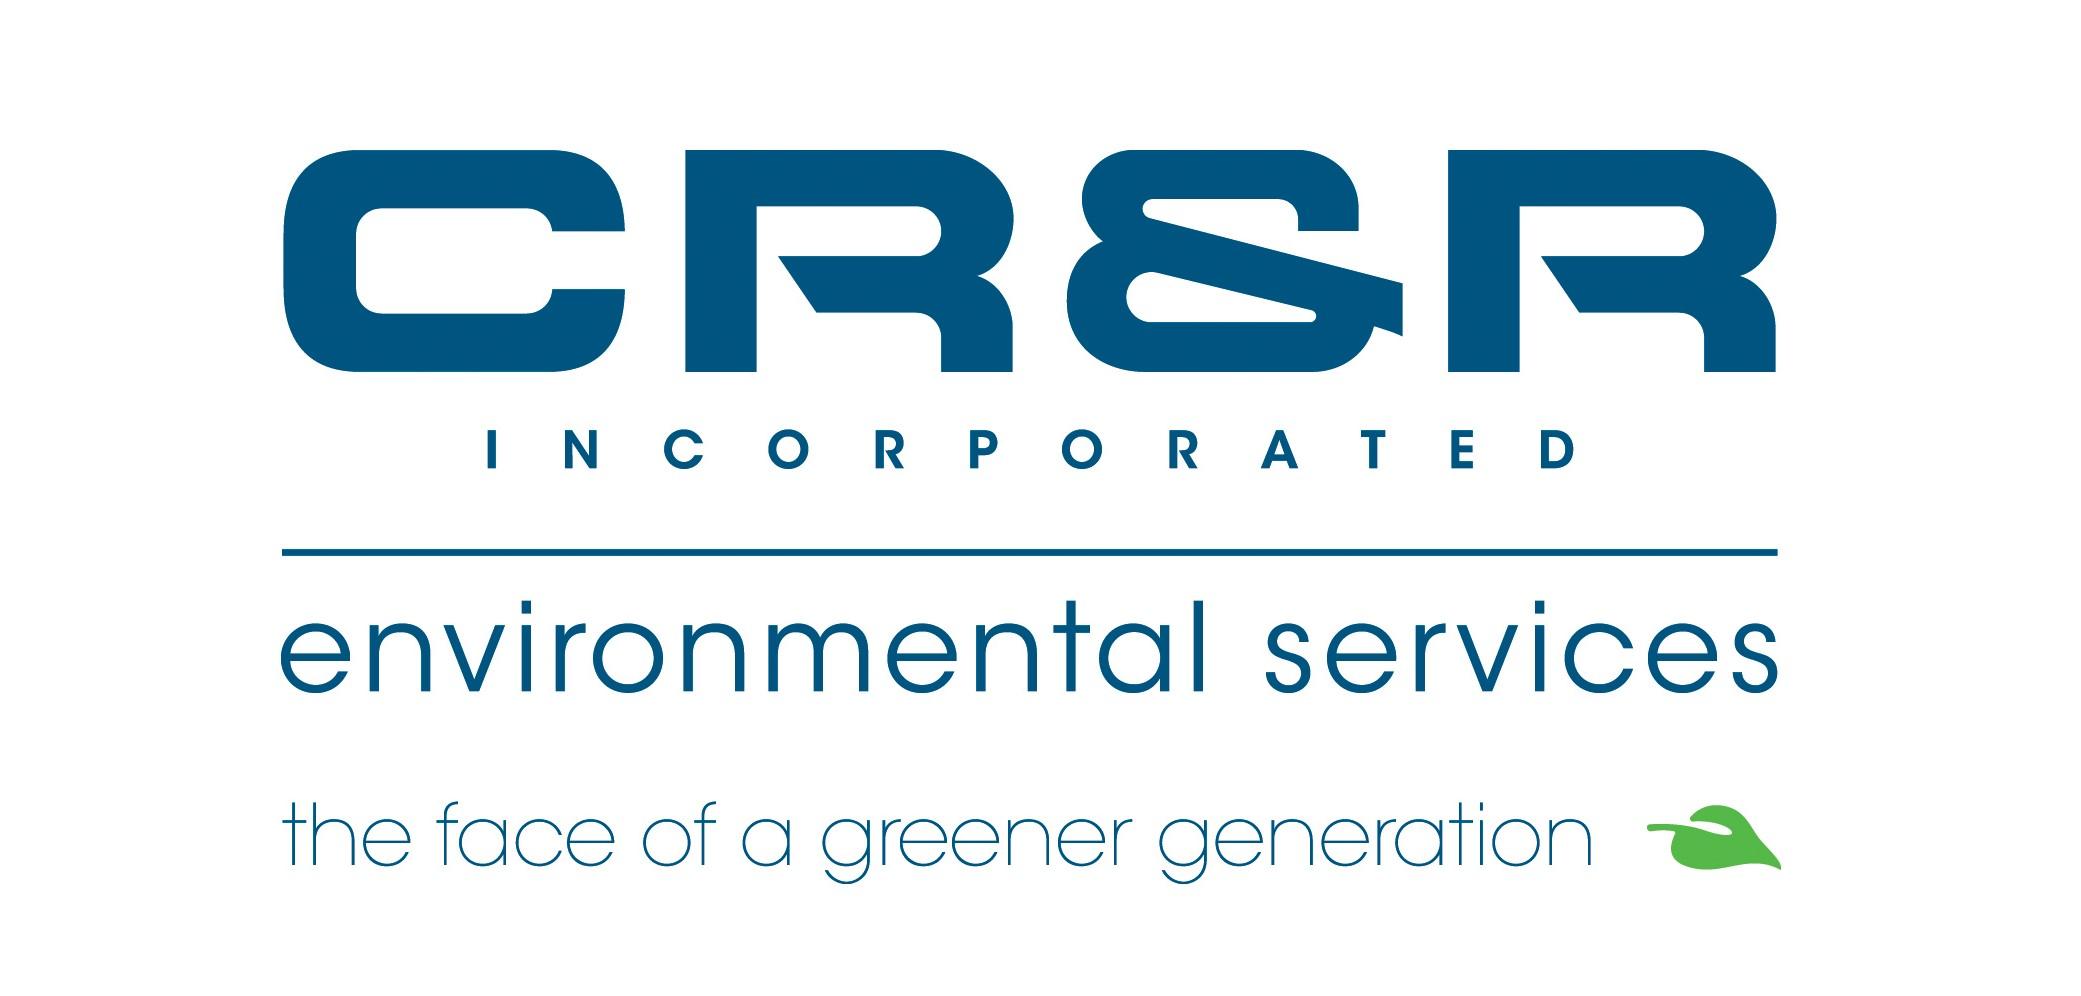 CR&R_logo